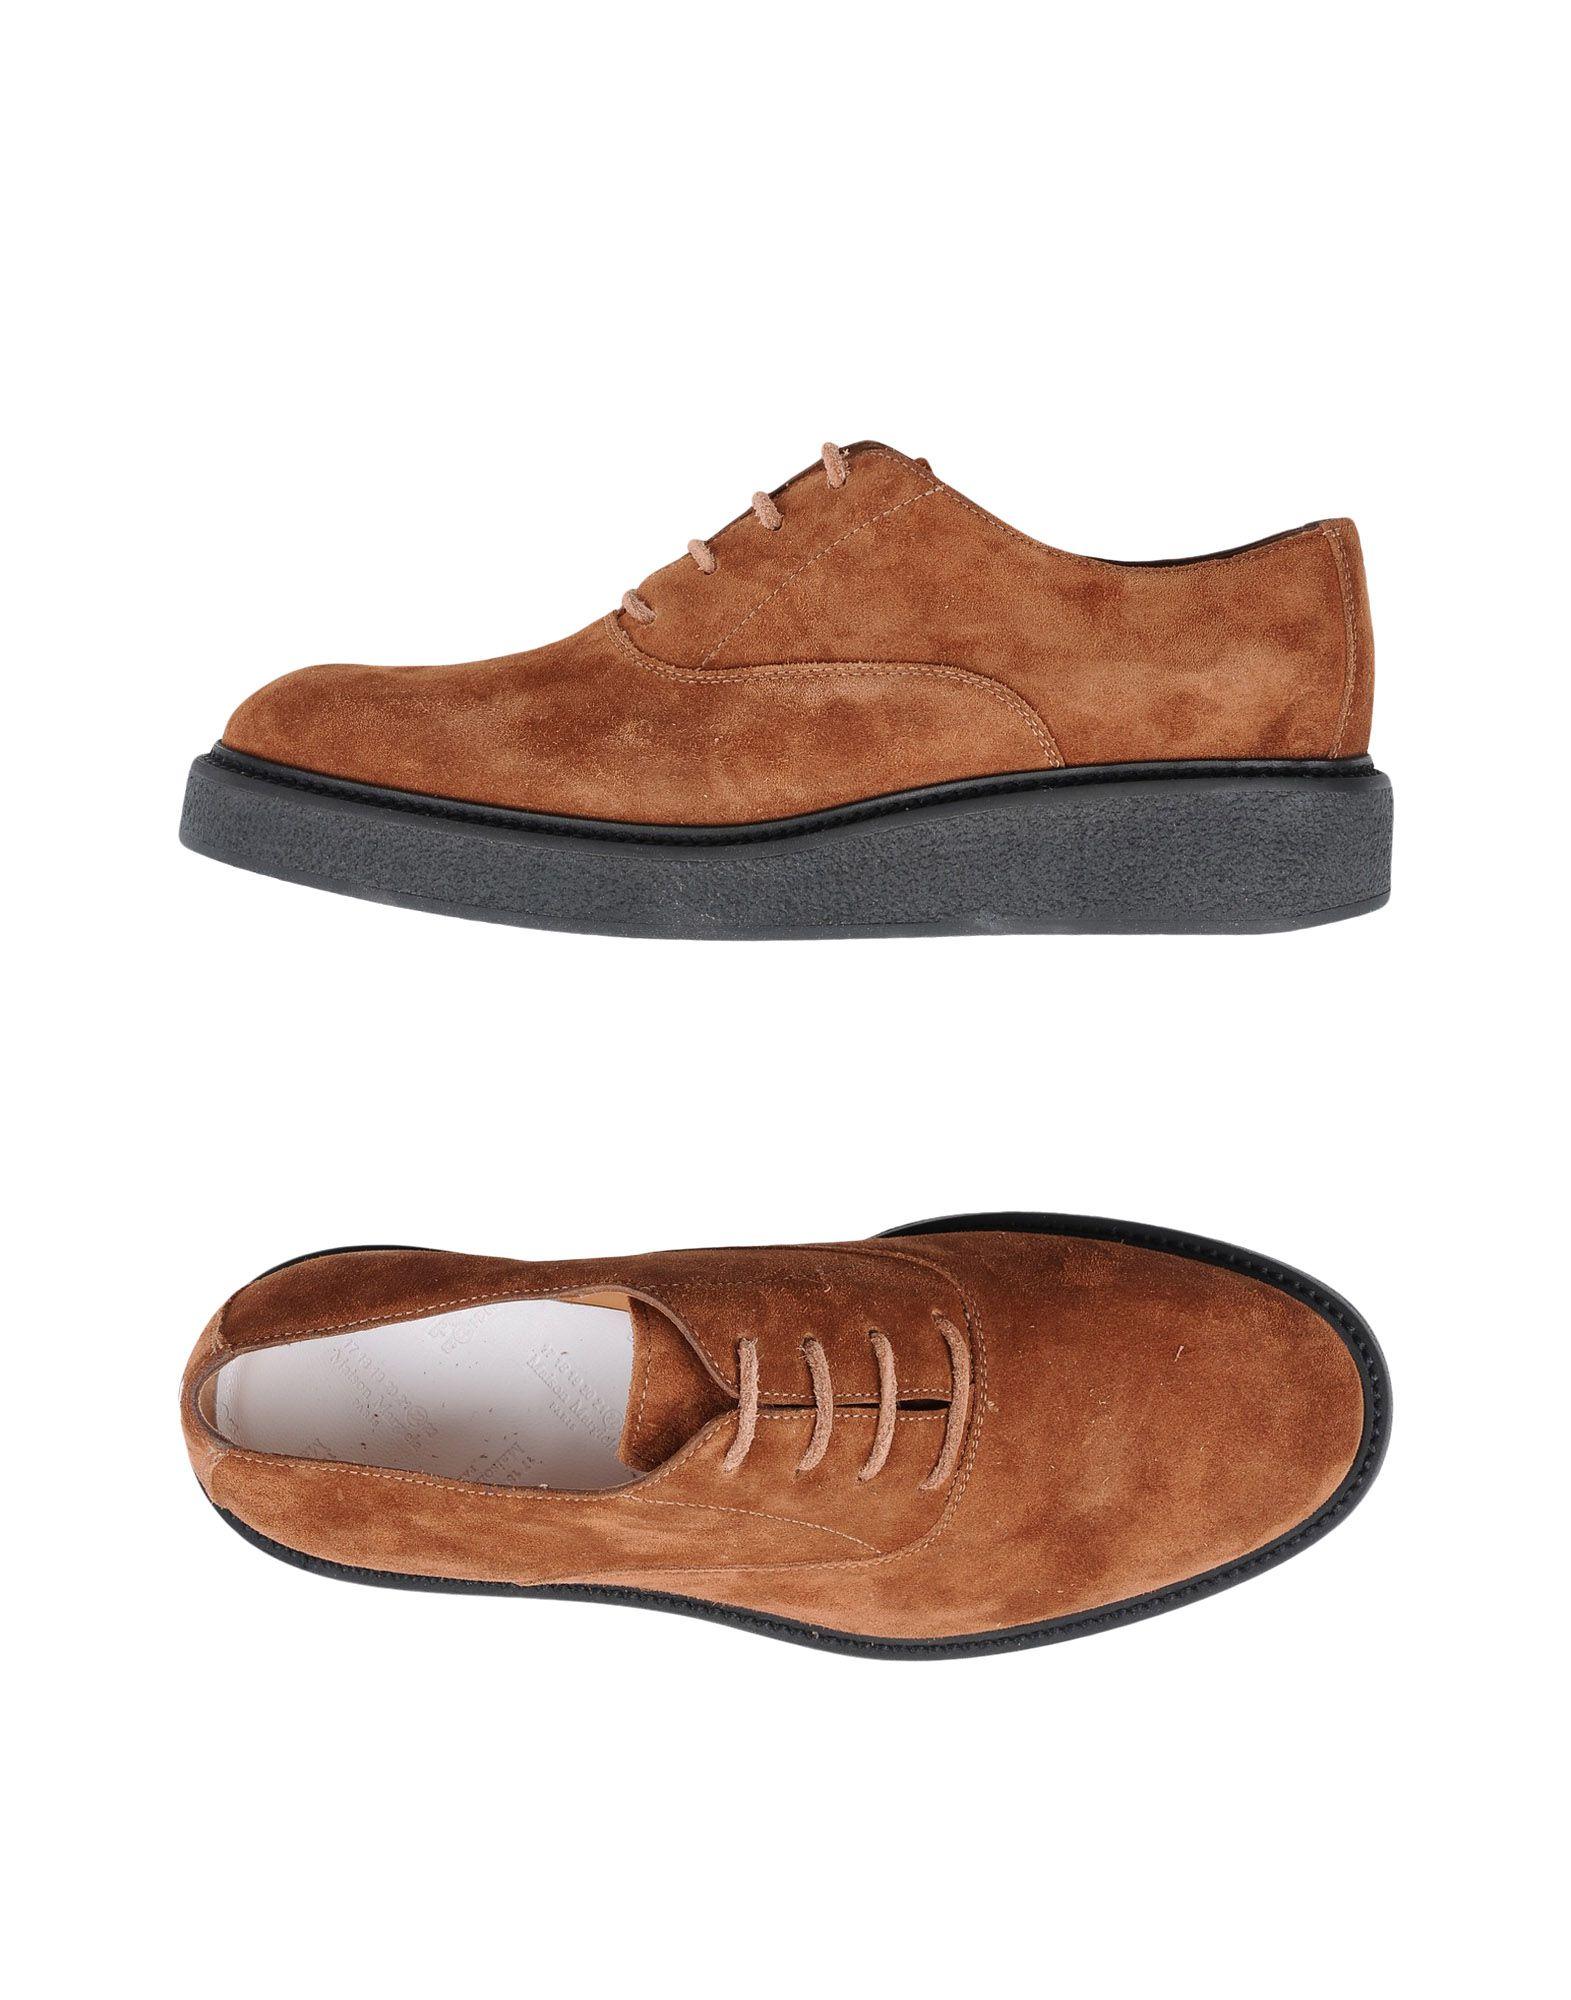 Maison Margiela Schnürschuhe Herren beliebte  11317451VD Gute Qualität beliebte Herren Schuhe 18714d